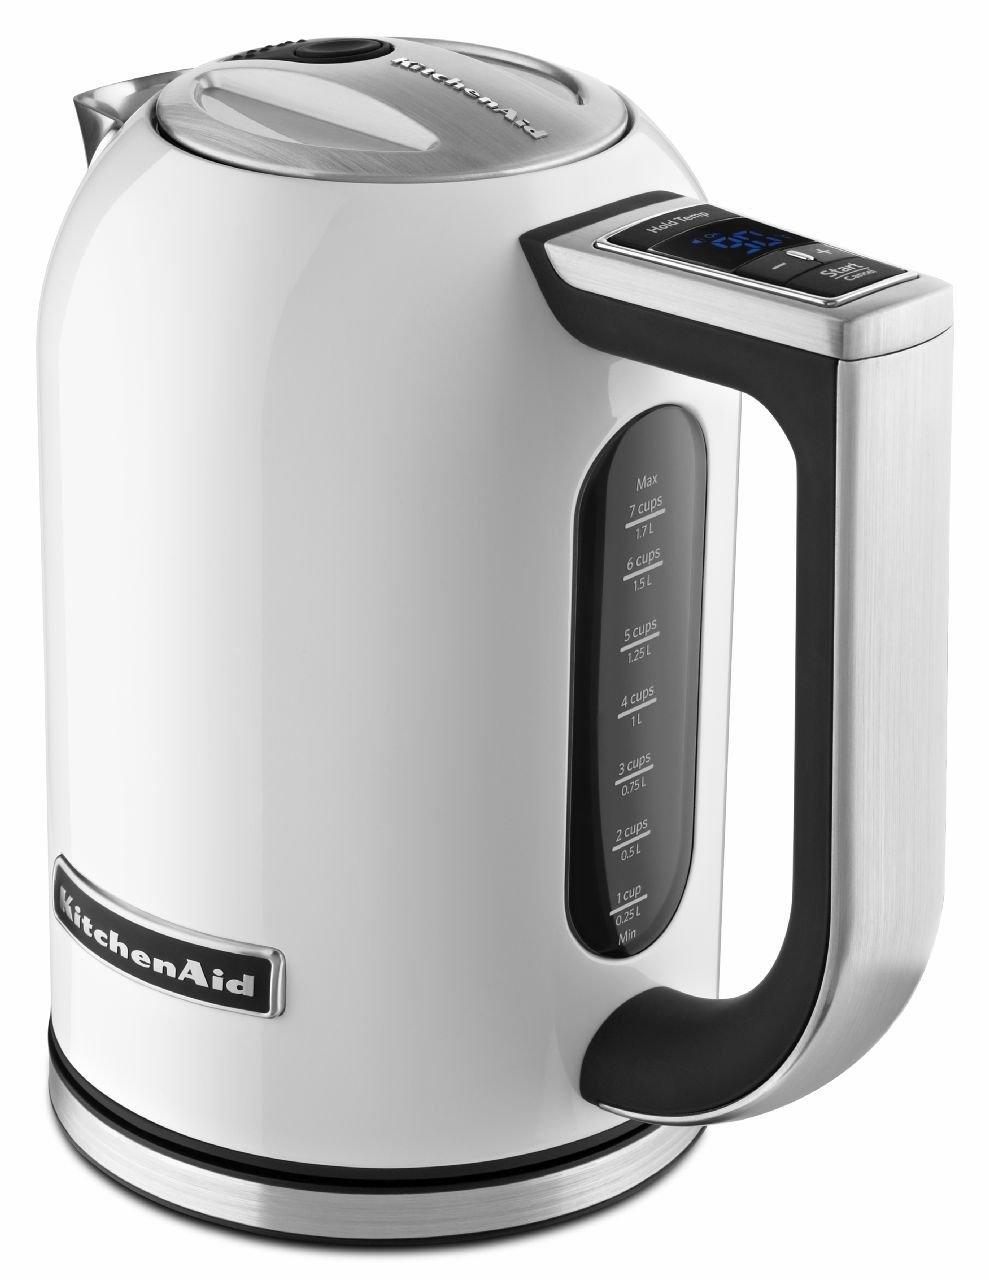 Kitchenaid Electric Kettle ~ Kitchenaid electric kettle kek ebay